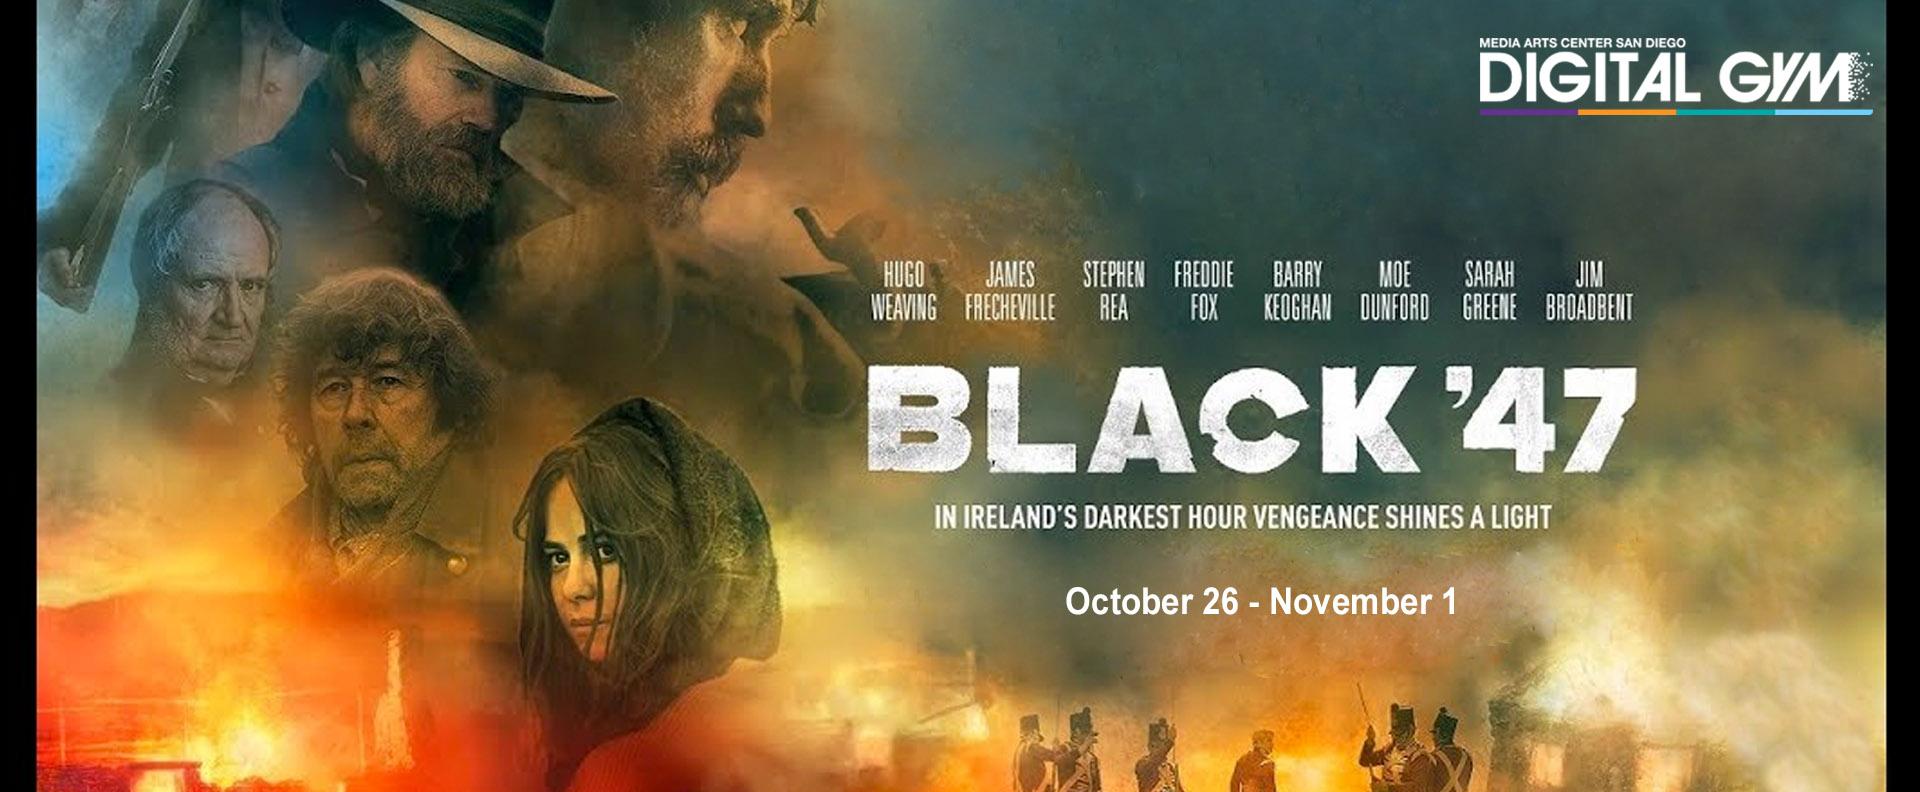 Black '47 (October 26 – November 1)